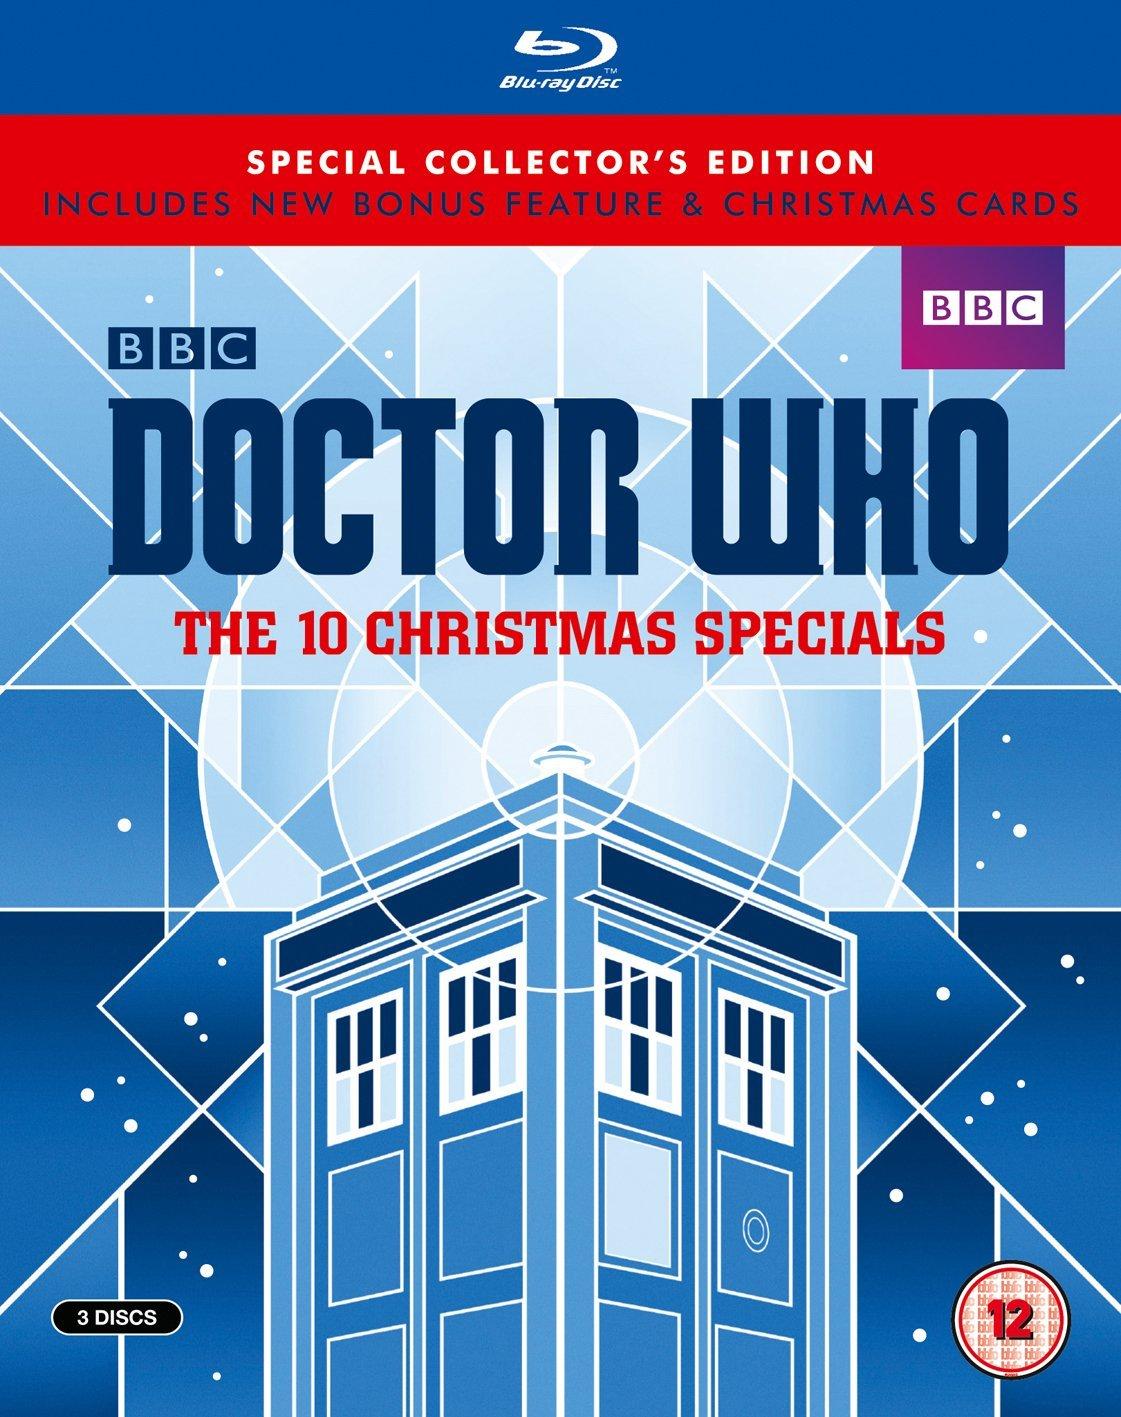 Doctor Who - The 10 Christmas Specials Limited Edition Reino Unido Blu-ray: Amazon.es: David Tennant, Matt Smith, Peter Capaldi, David Tennant, Matt Smith: Cine y Series TV